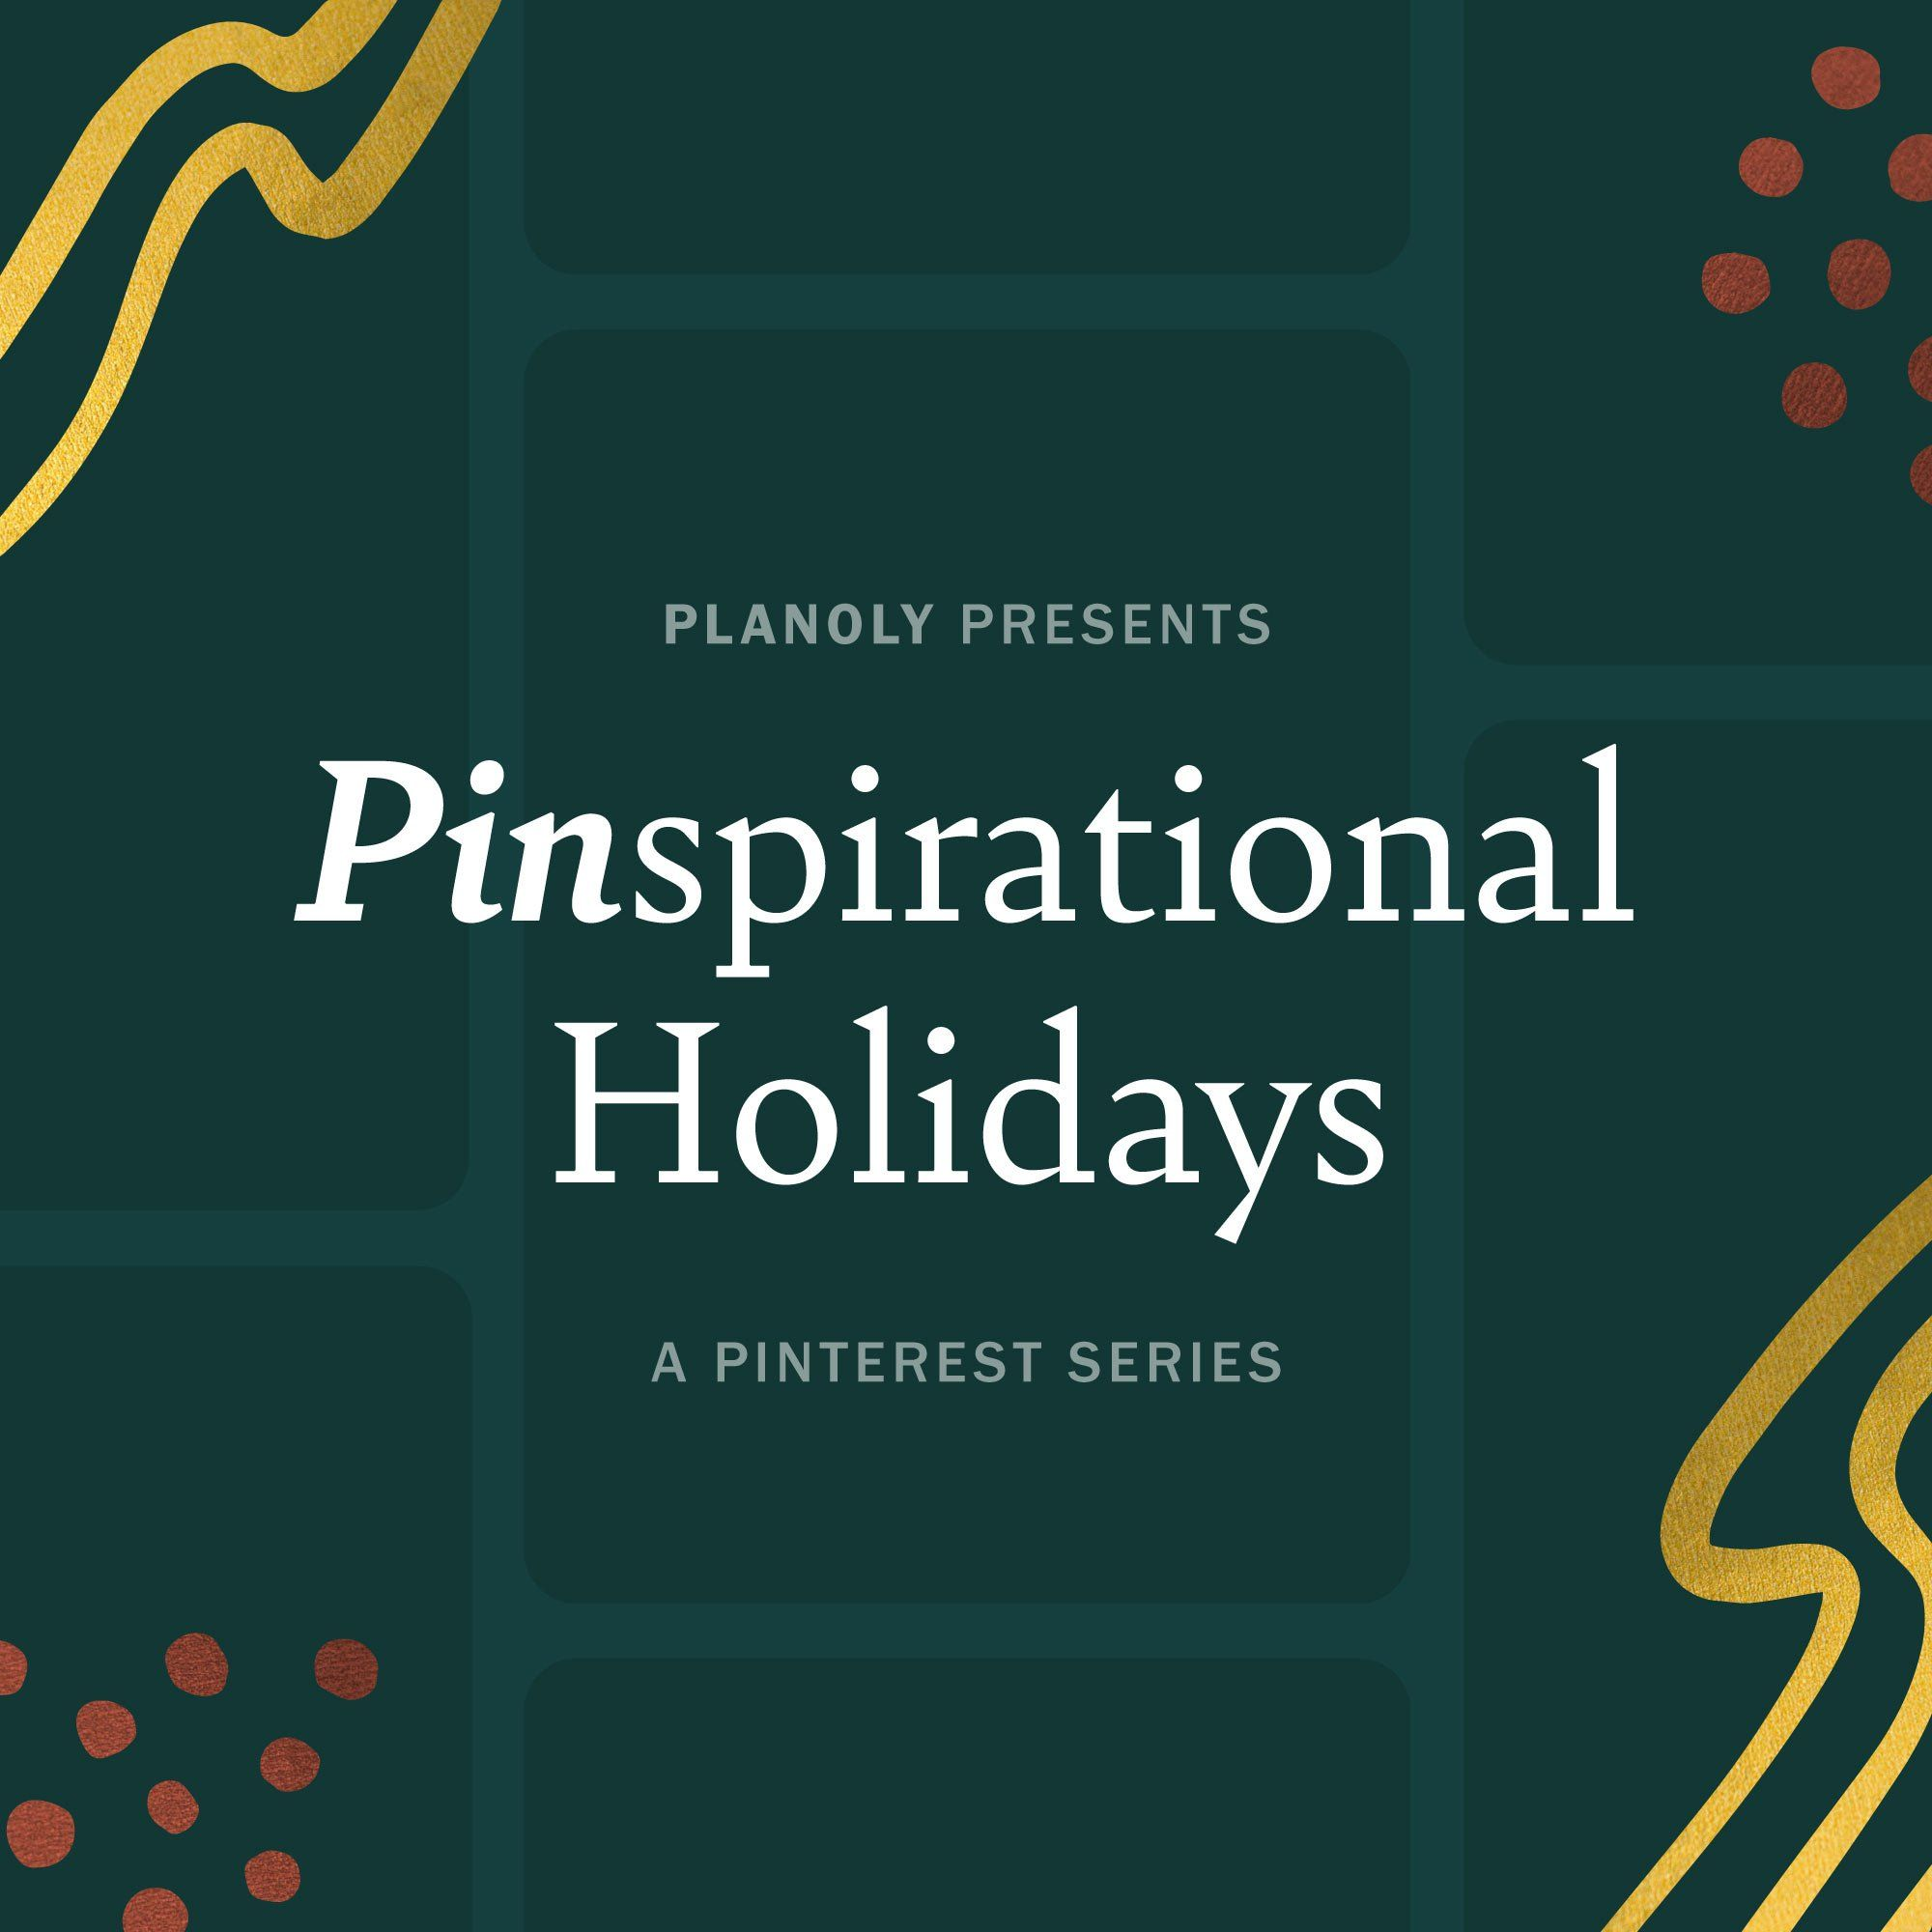 PP_Pinspirational Holidays_General Promo (1)